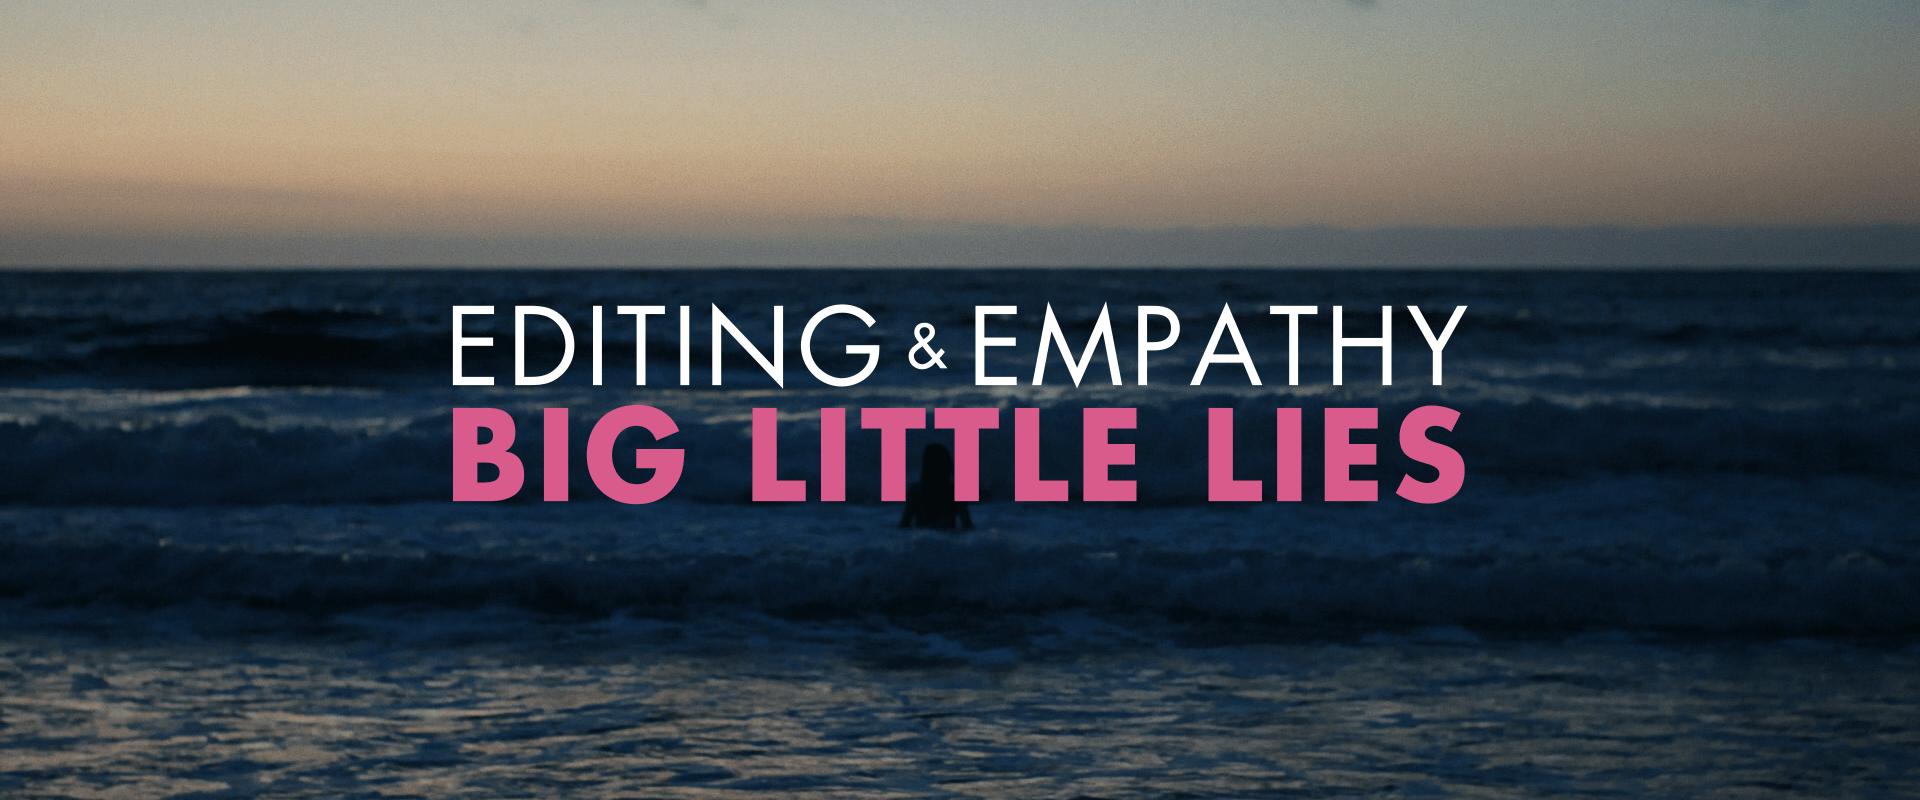 big little lies - editing & empathy